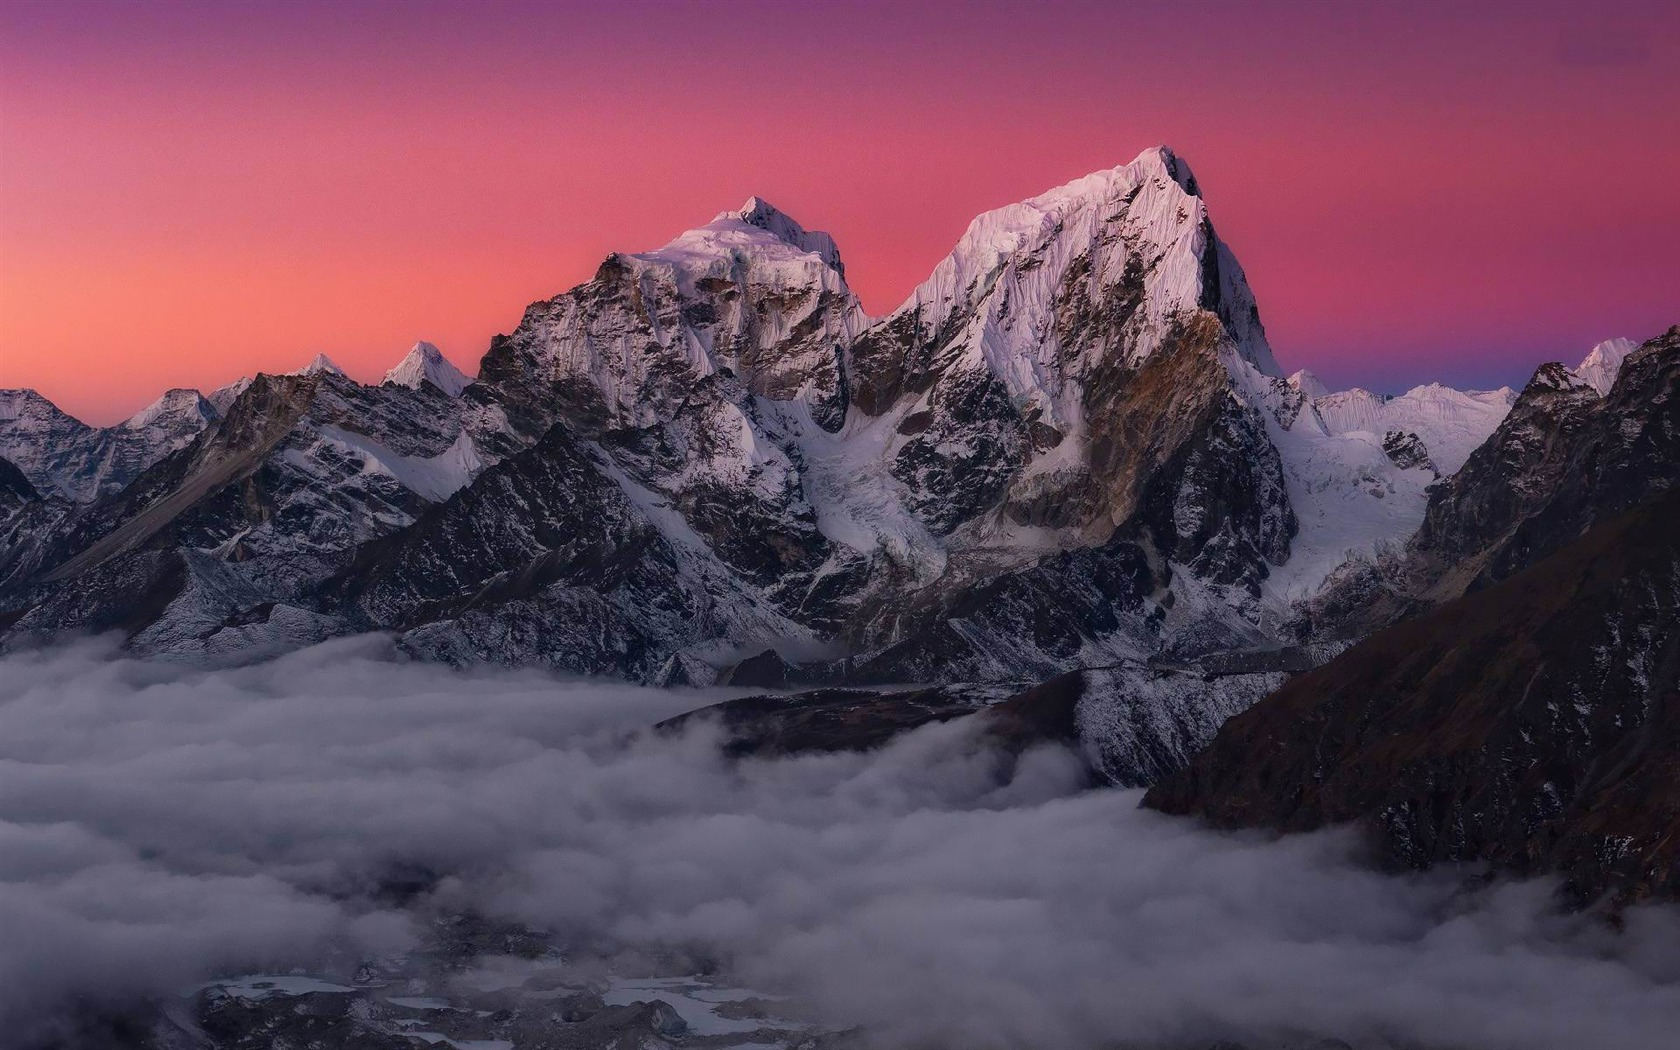 Snowy Mountains Natural Landscape Desktop Wallpapers